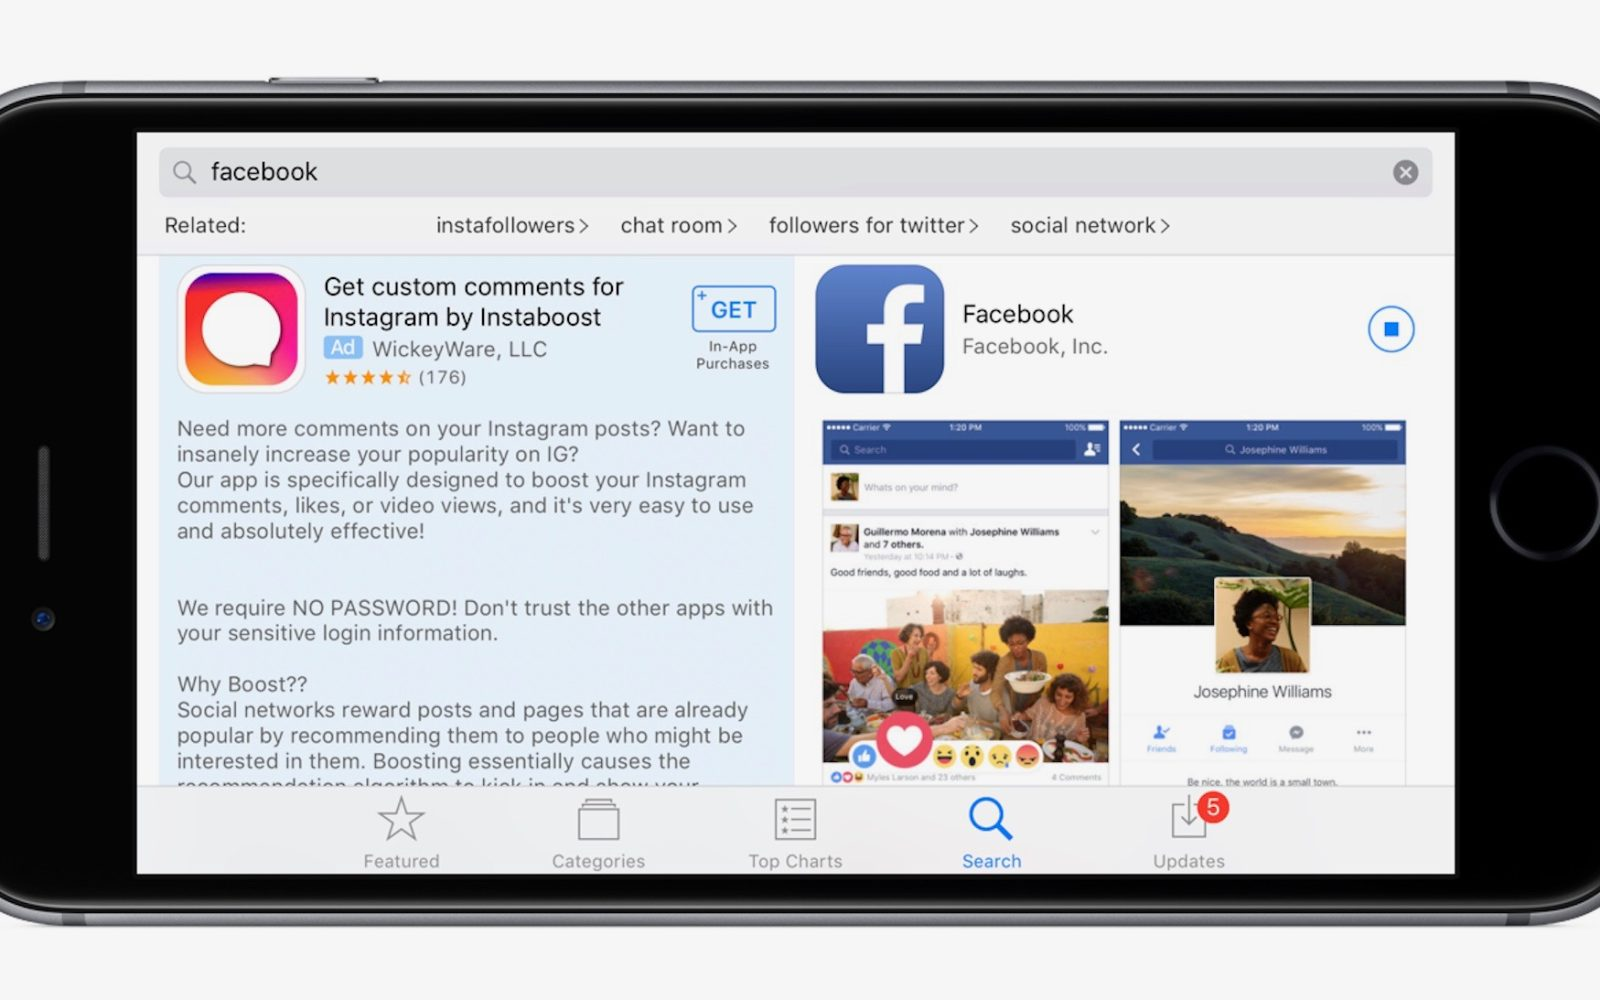 Apple extends developer promotion for free $100 App Store